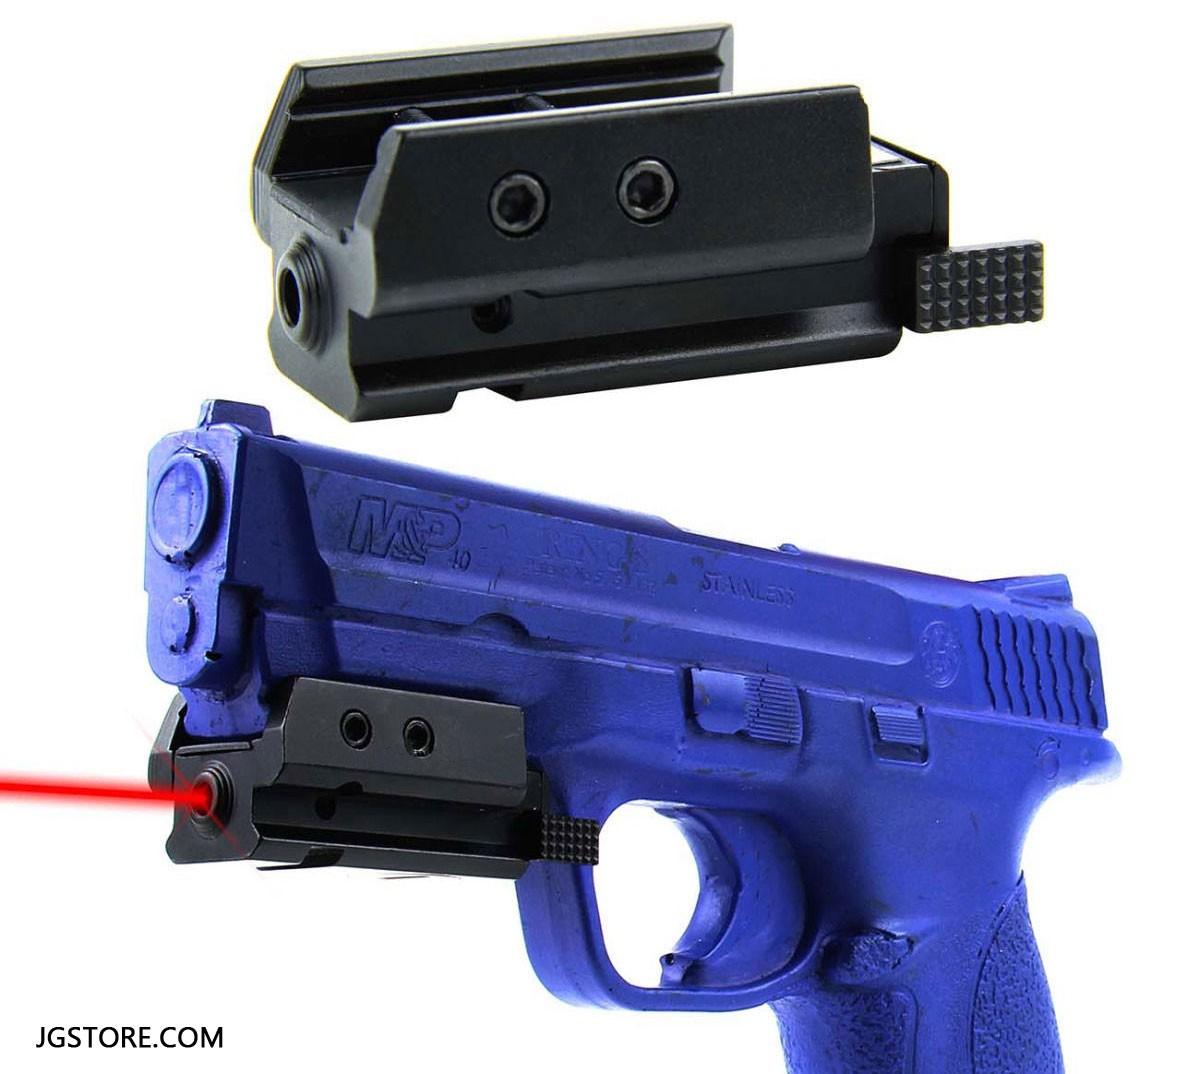 Low Profile Pistol Mini Picatinny / Weaver Rail Red Dot Laser Sight for S&W, XD, GLK, SIG